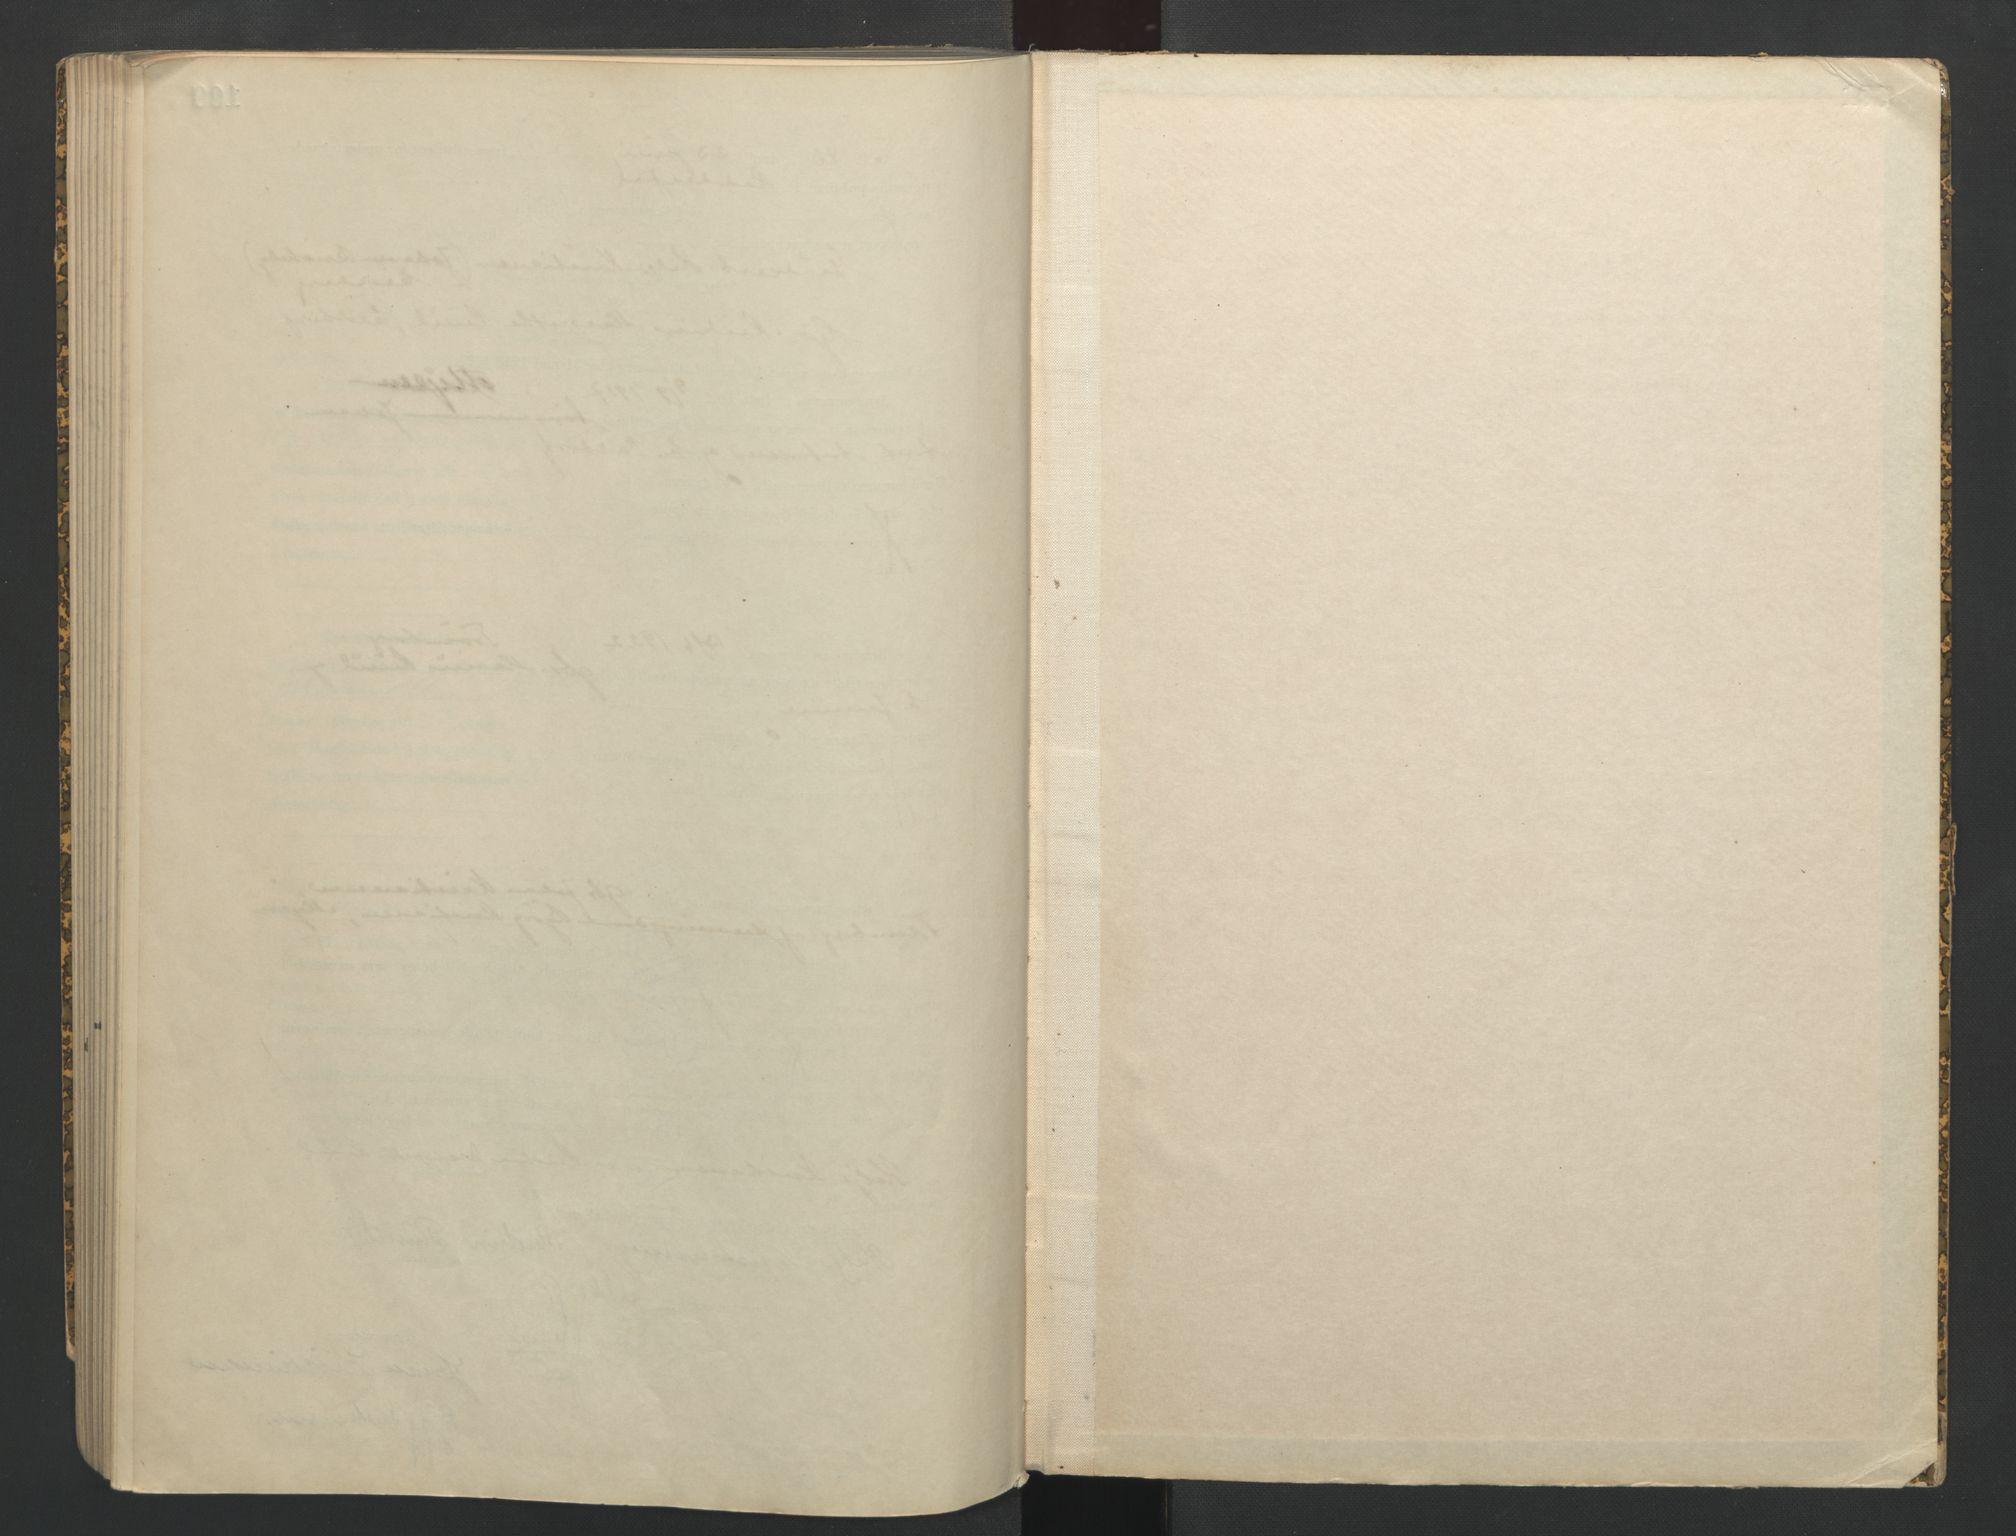 SAO, Rakkestad sorenskriveri, L/Lc/Lca/L0002: Vigselbøker, 1942-1943, s. upaginert